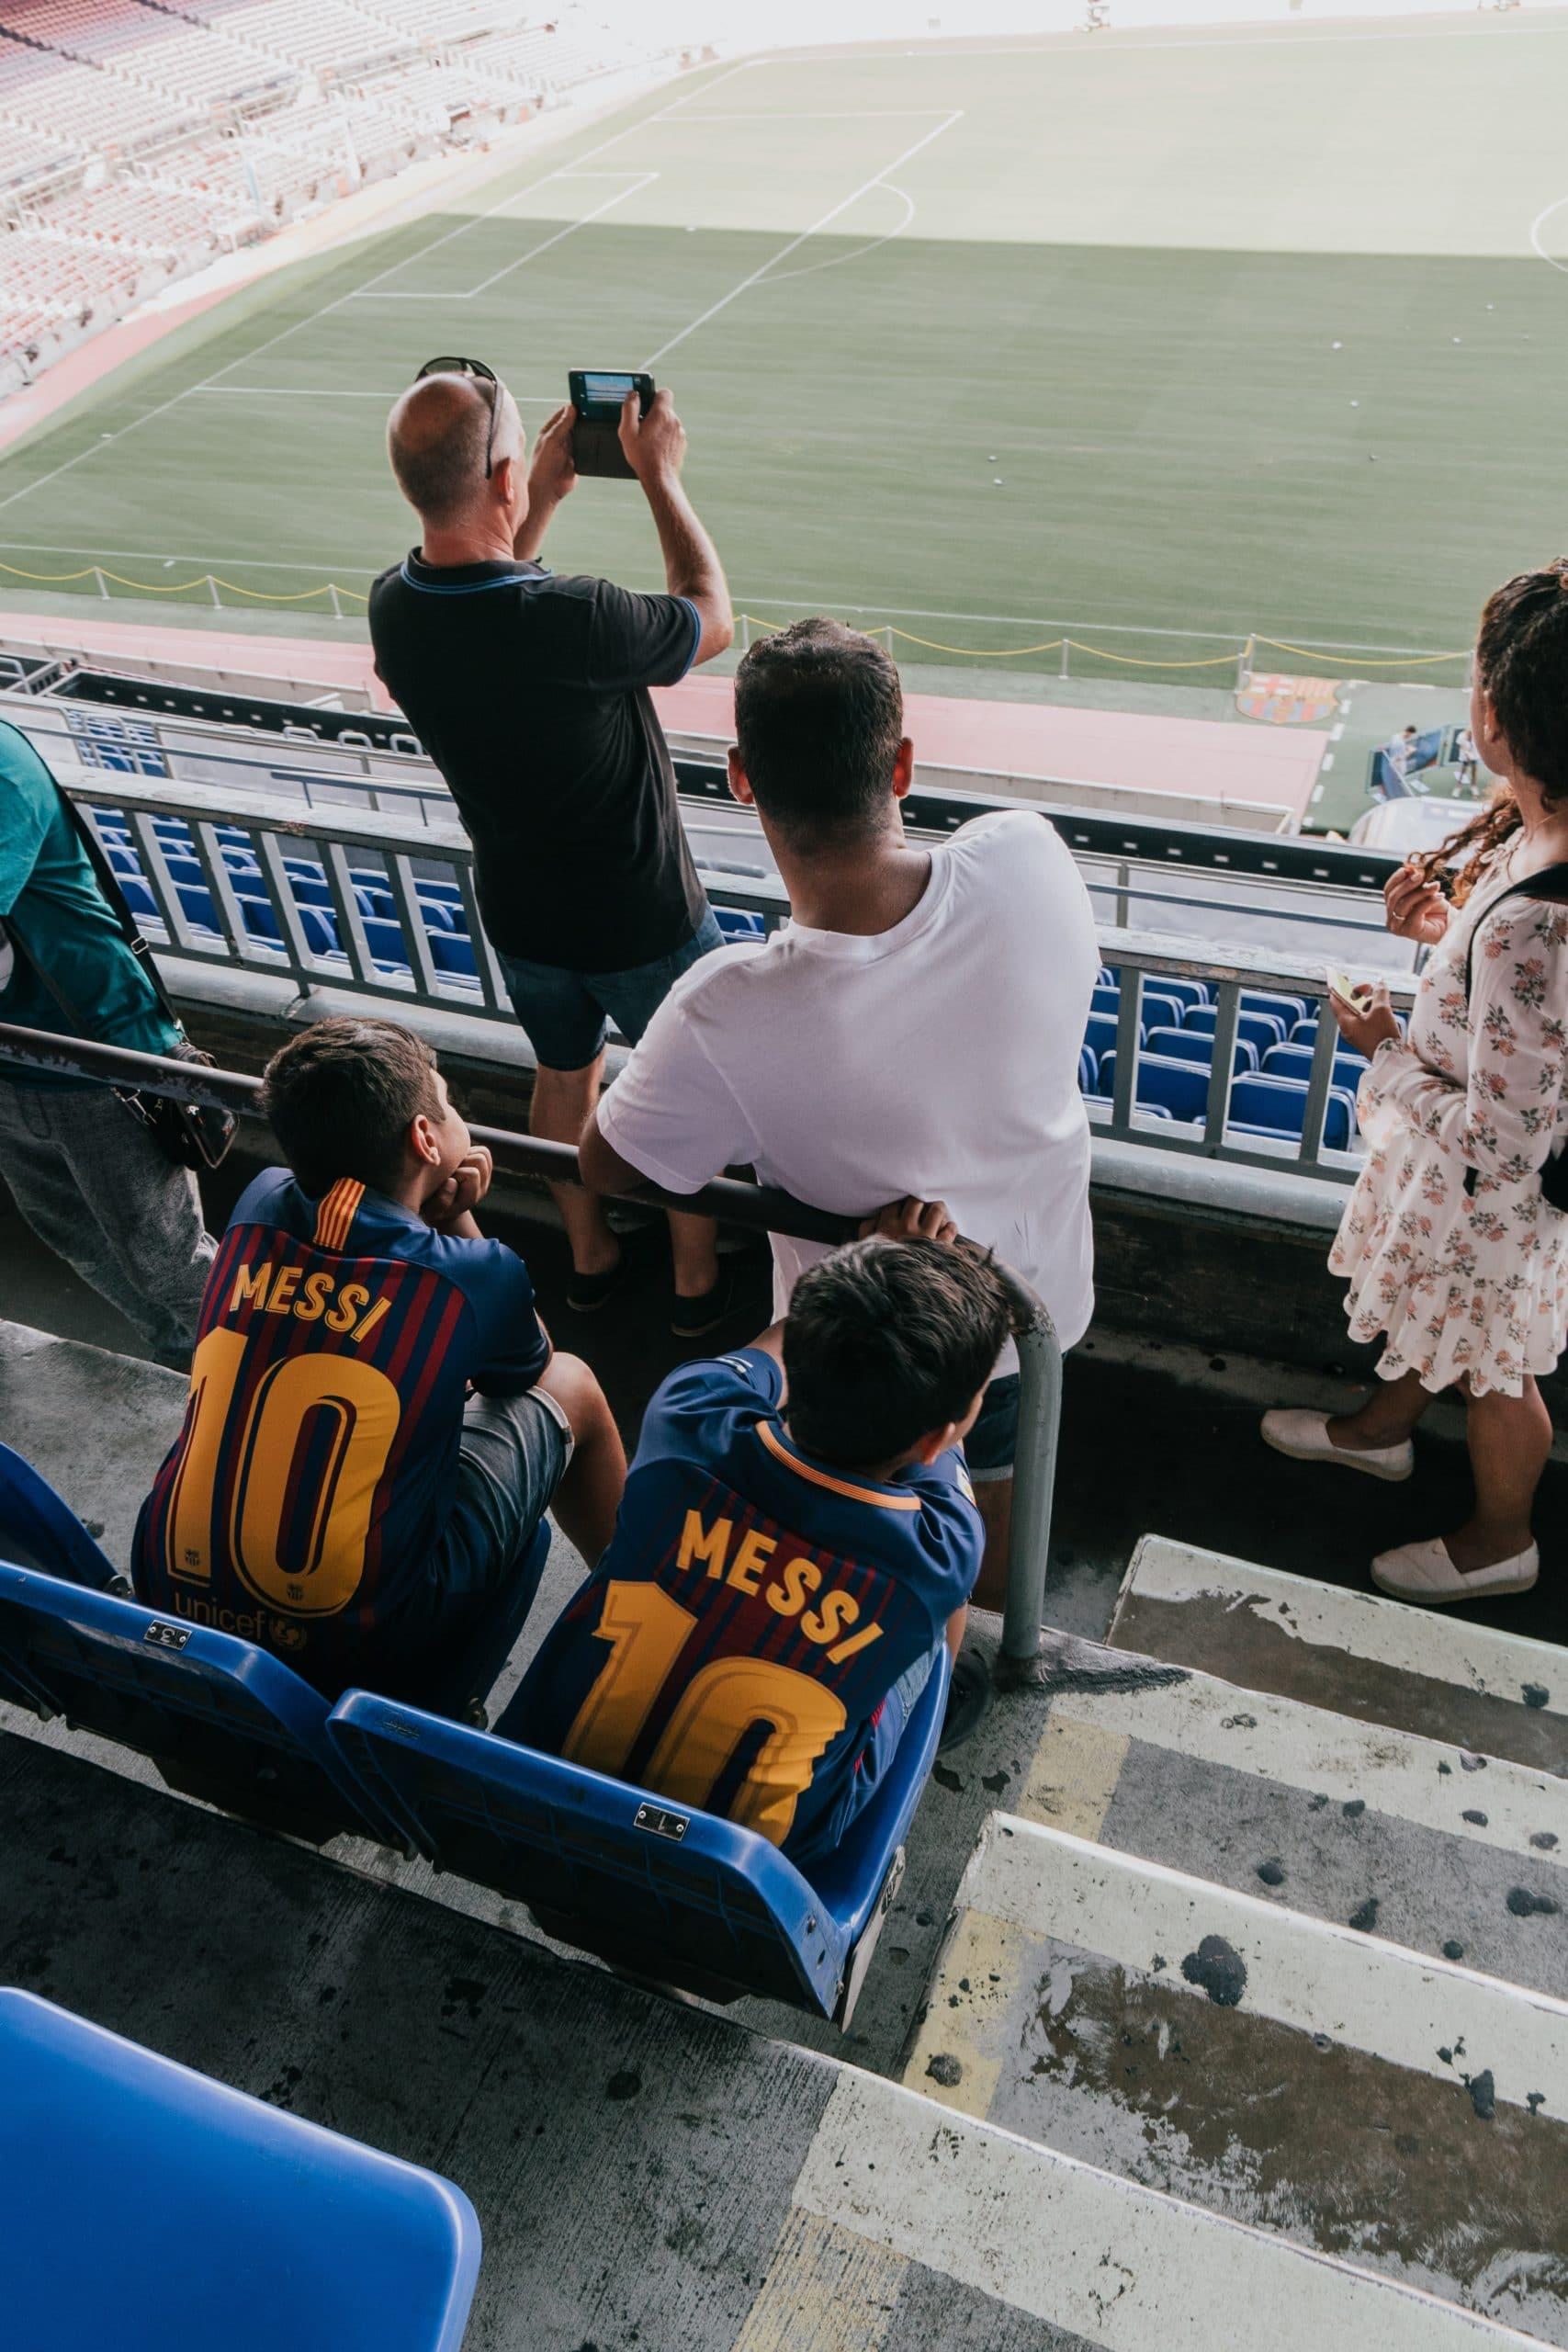 Marke Messi